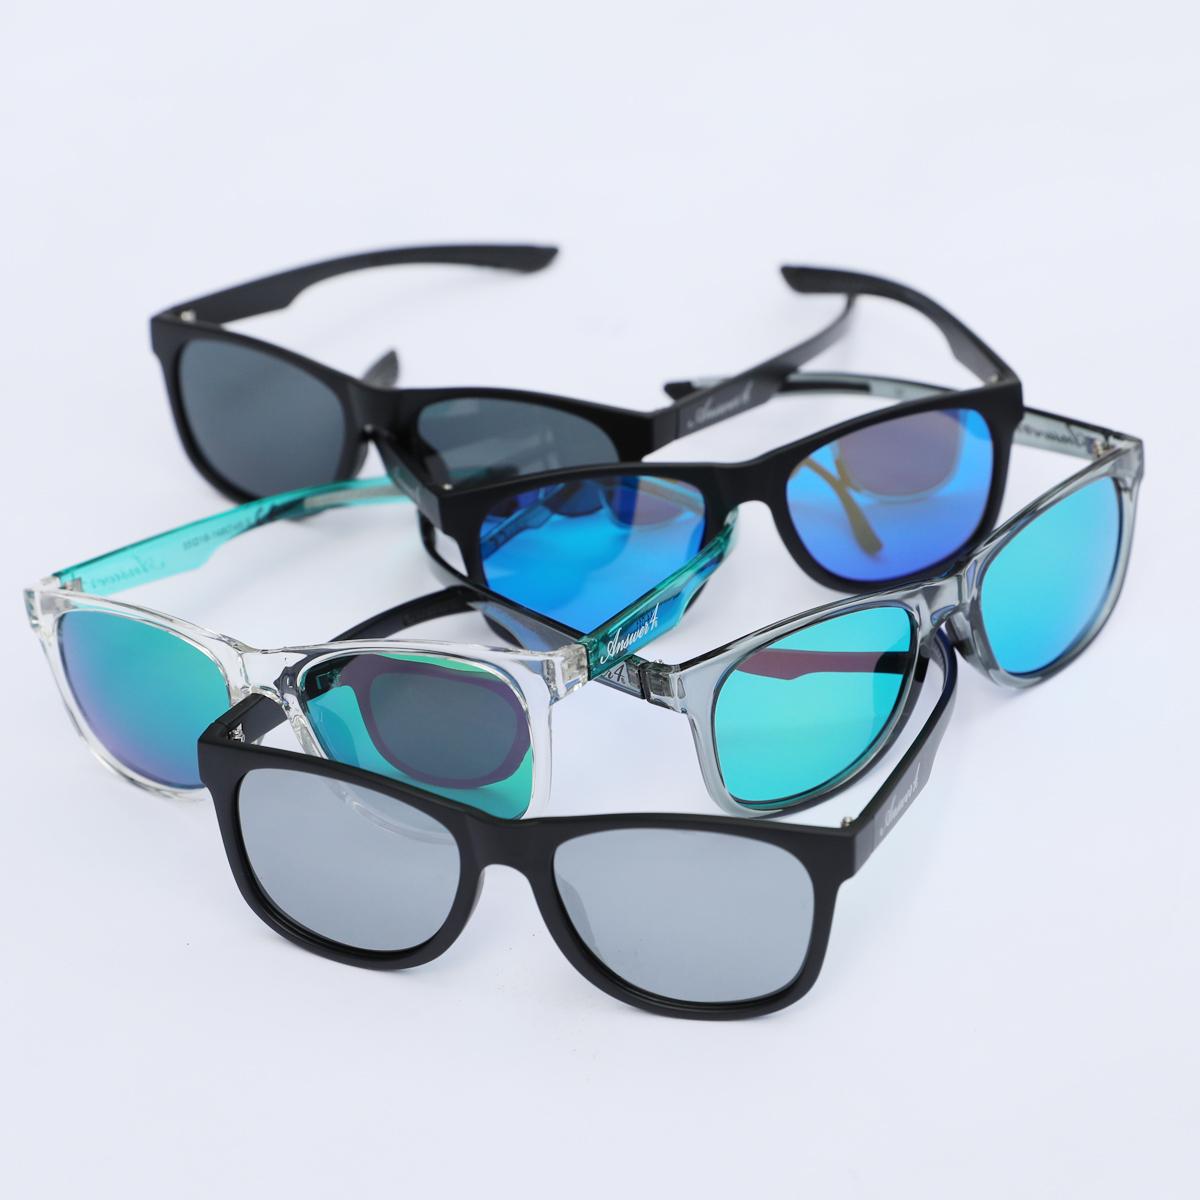 Sunglasses sg_1